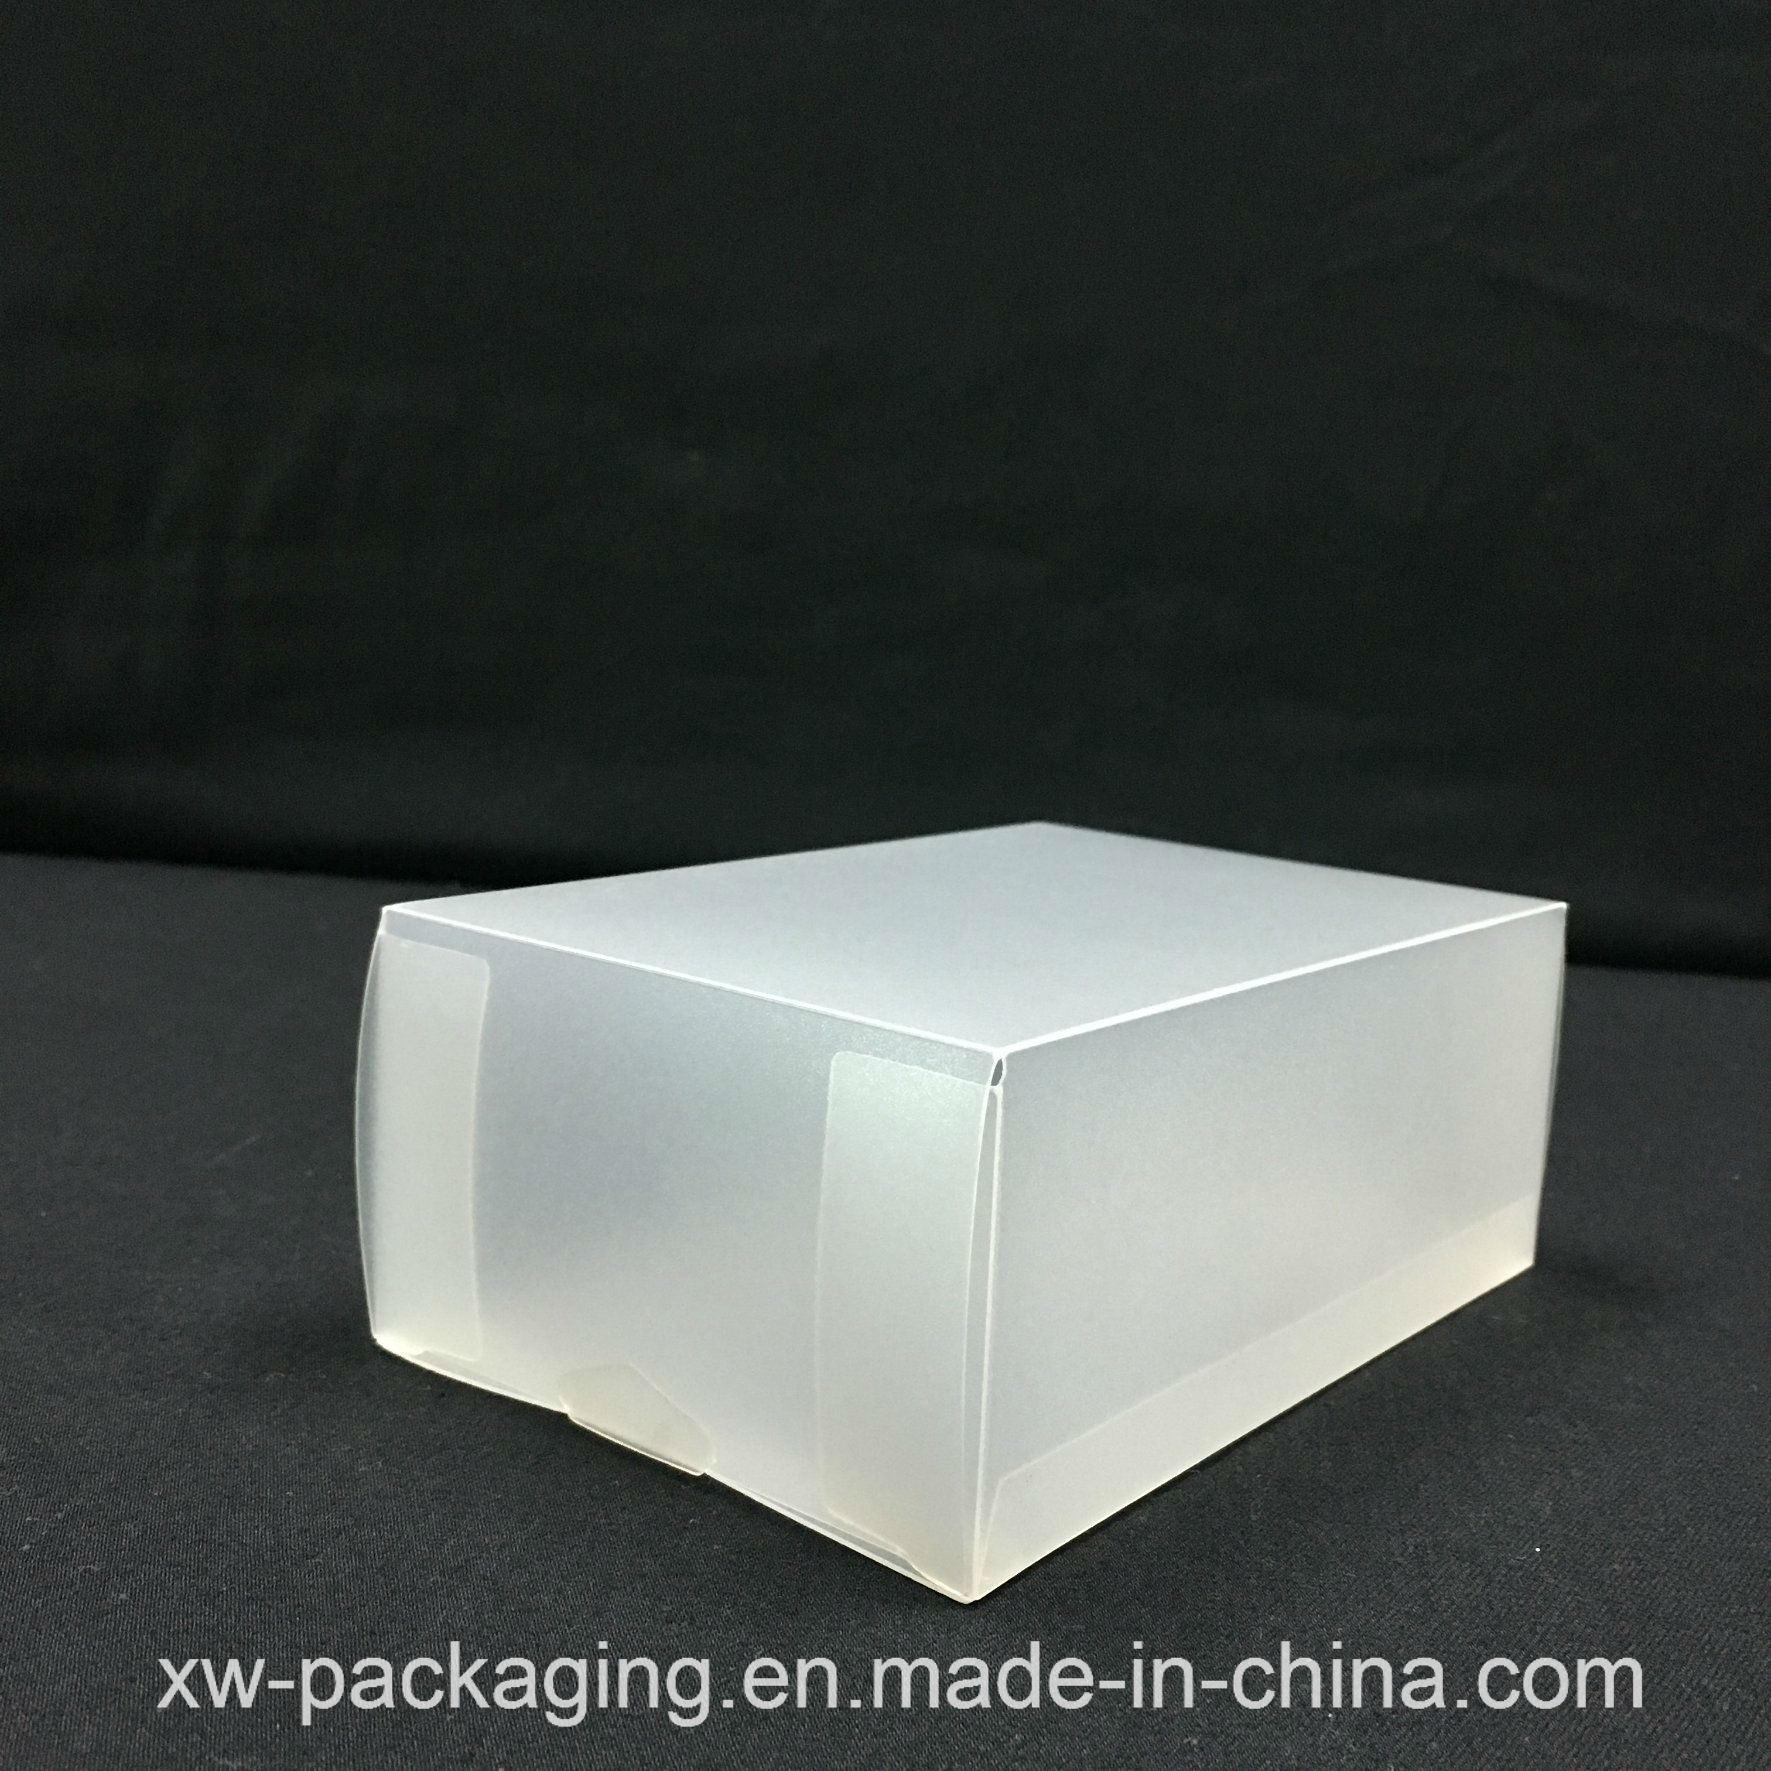 Custom Frosted Plastic Box for Gift Blister Packaging